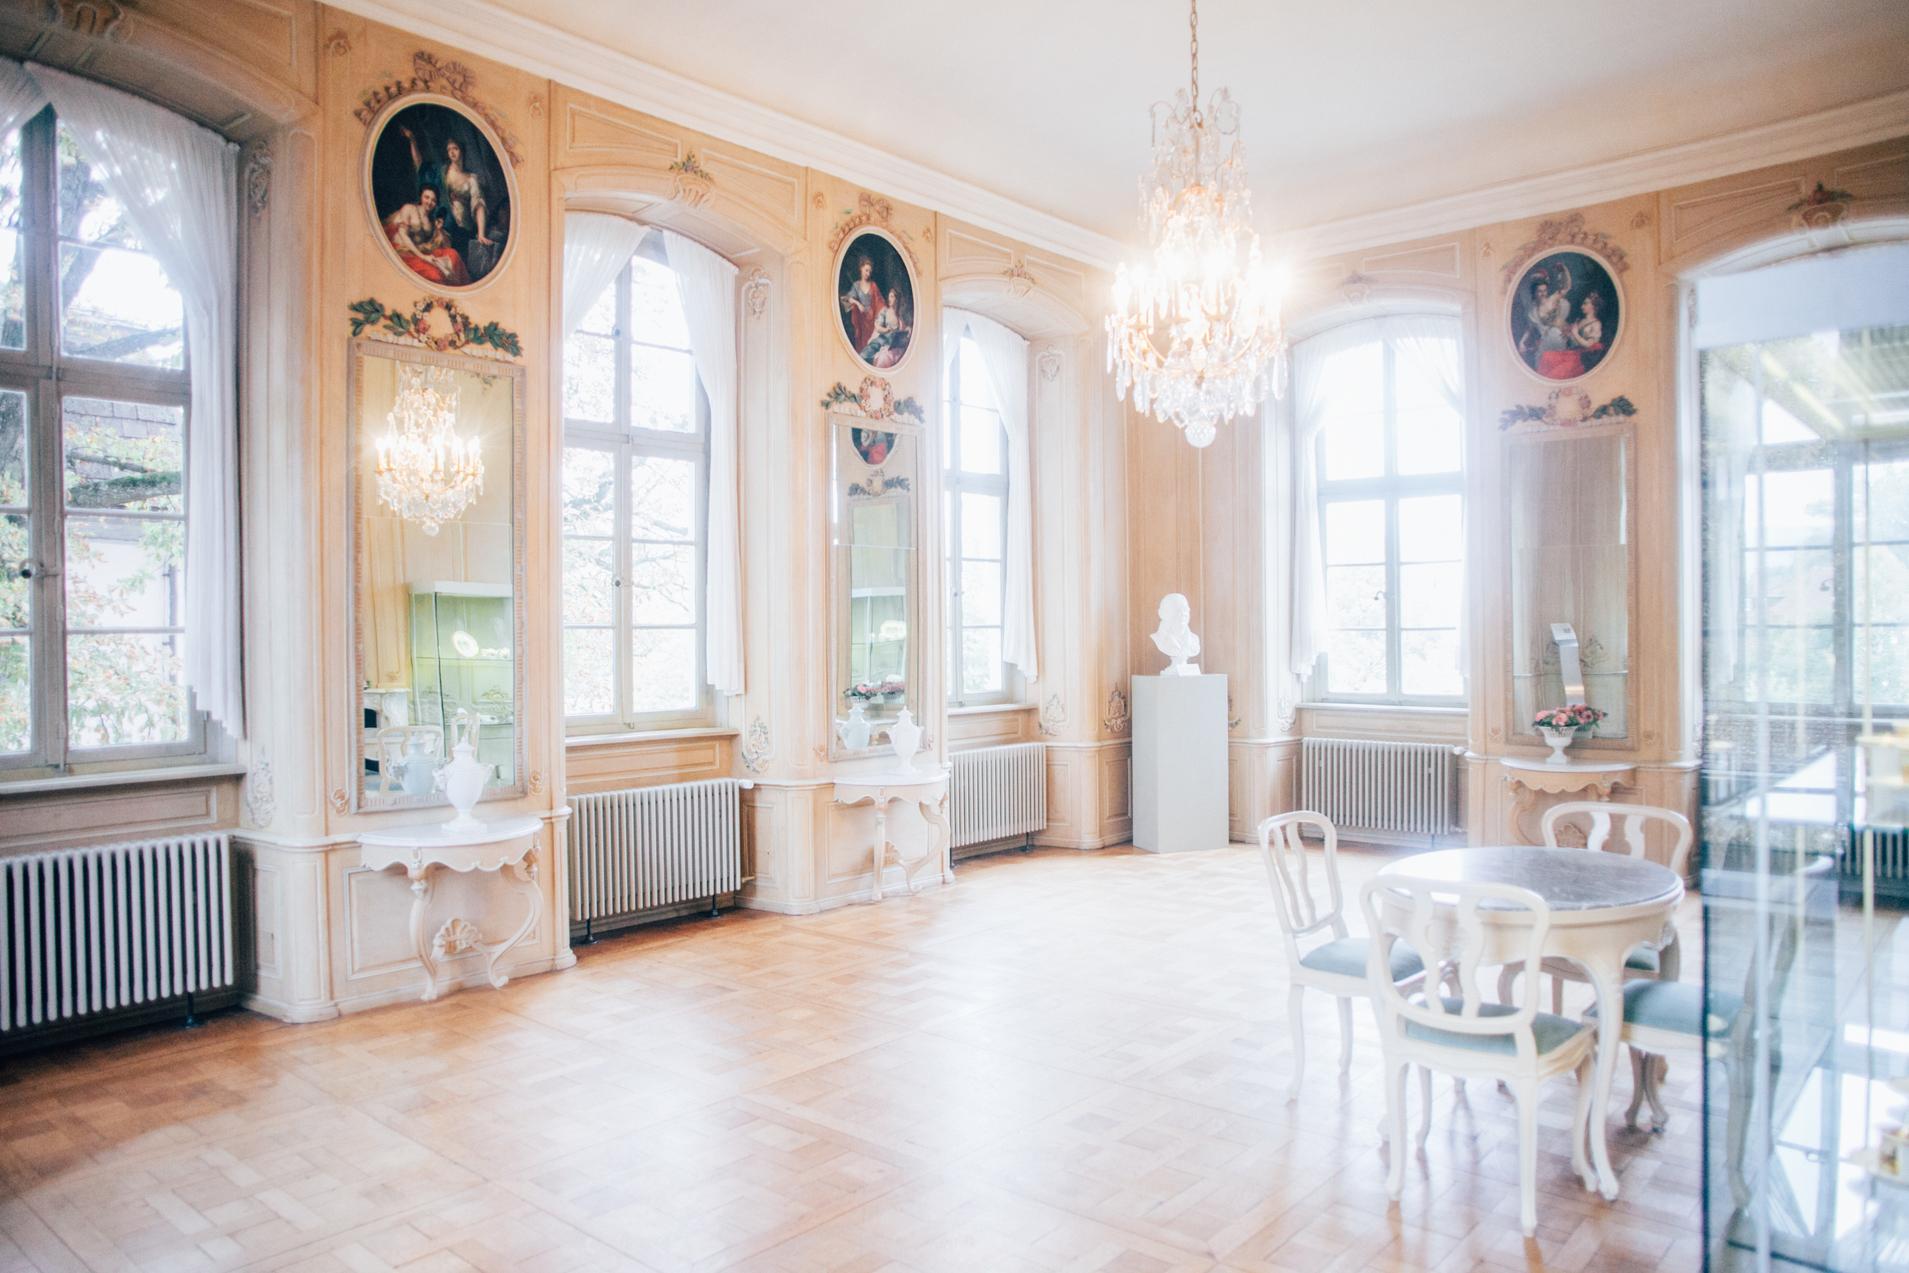 castle wedding, wedding venue, wedding in germany